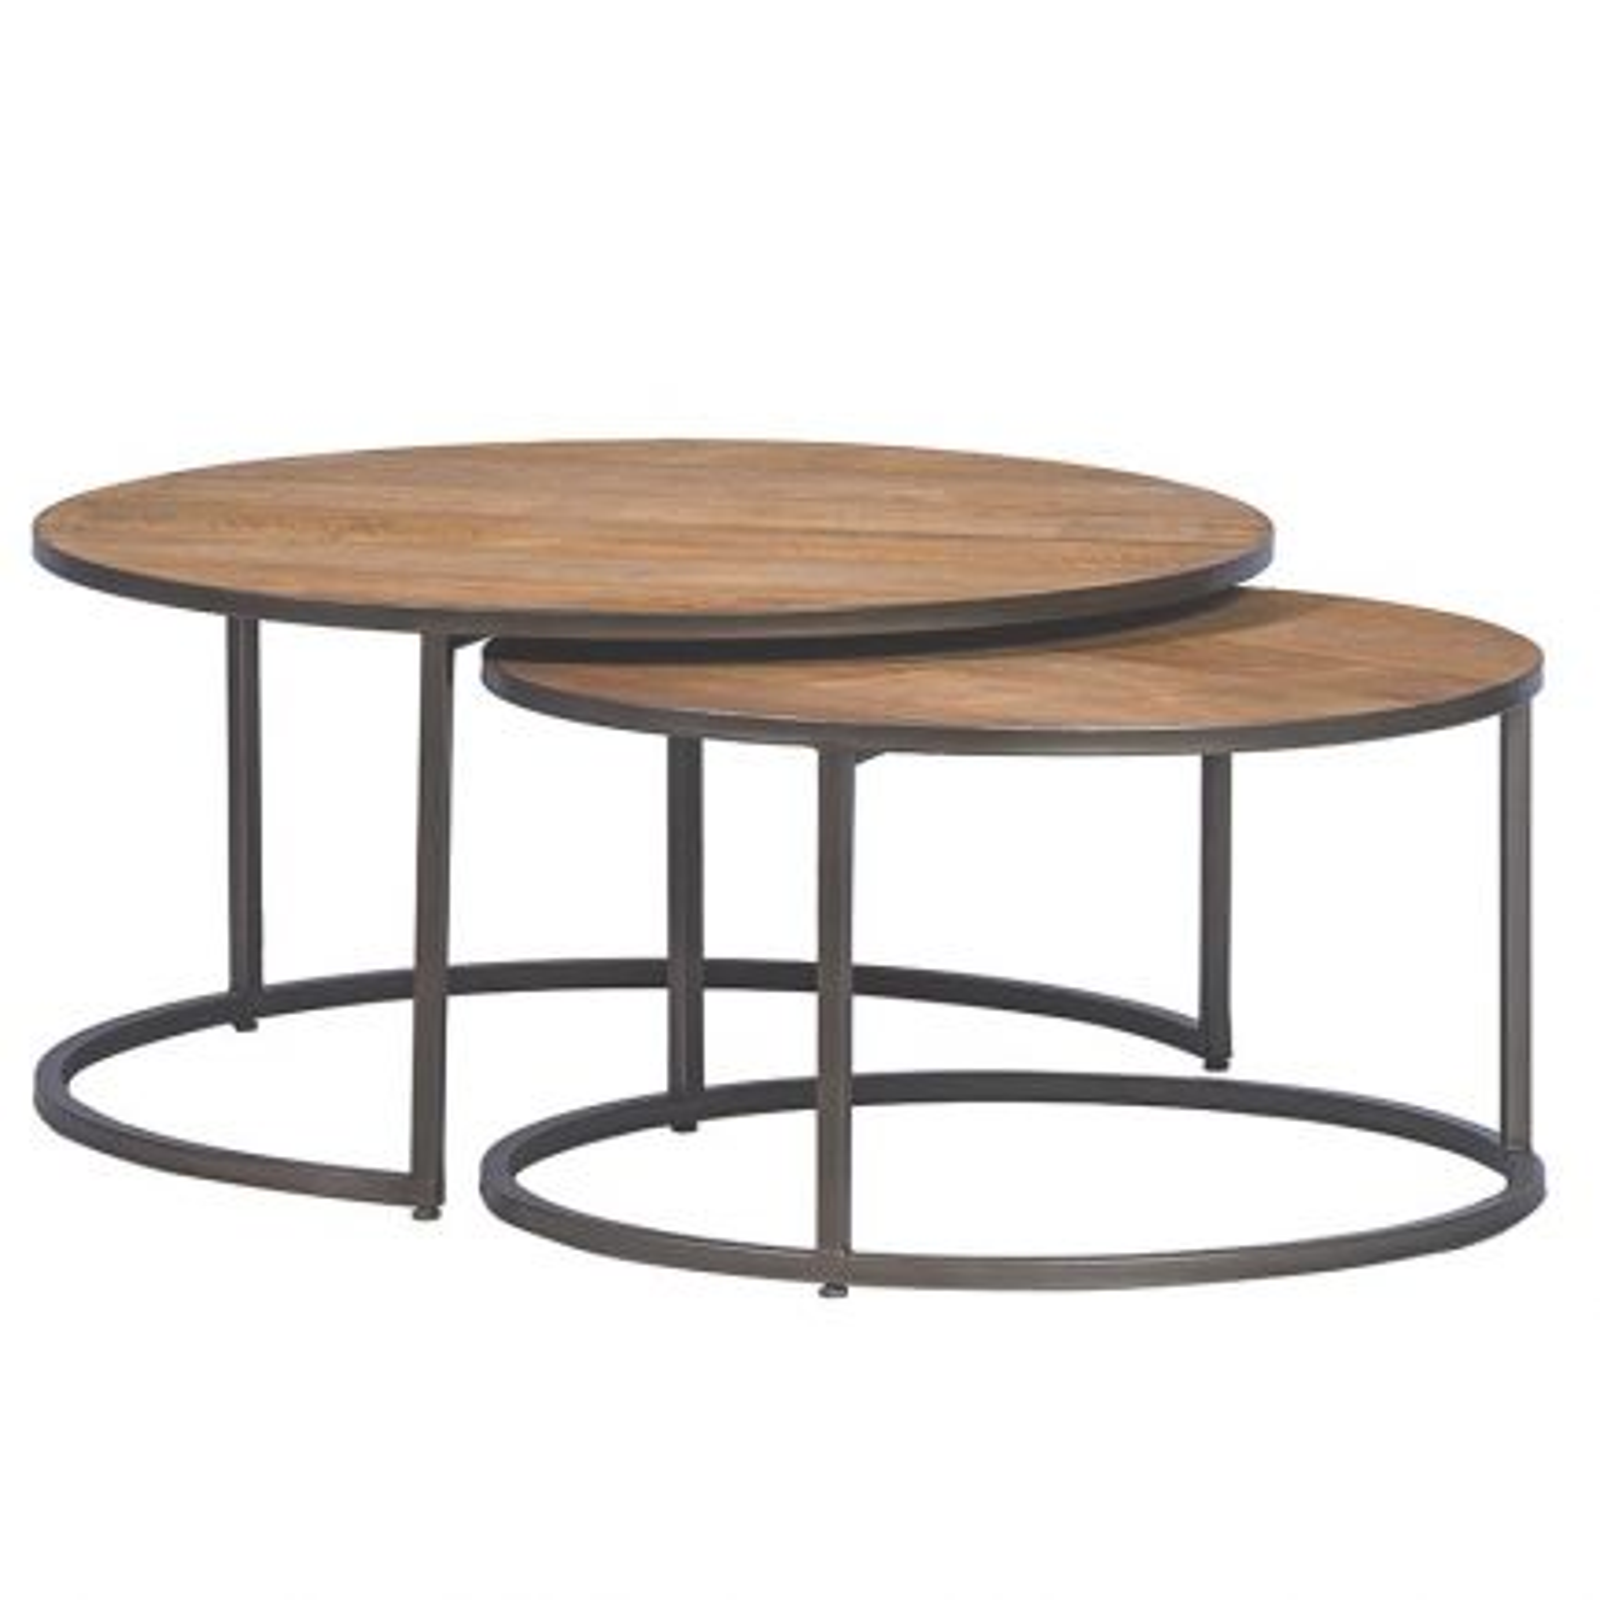 Tables basses gigognes | Teck Essential